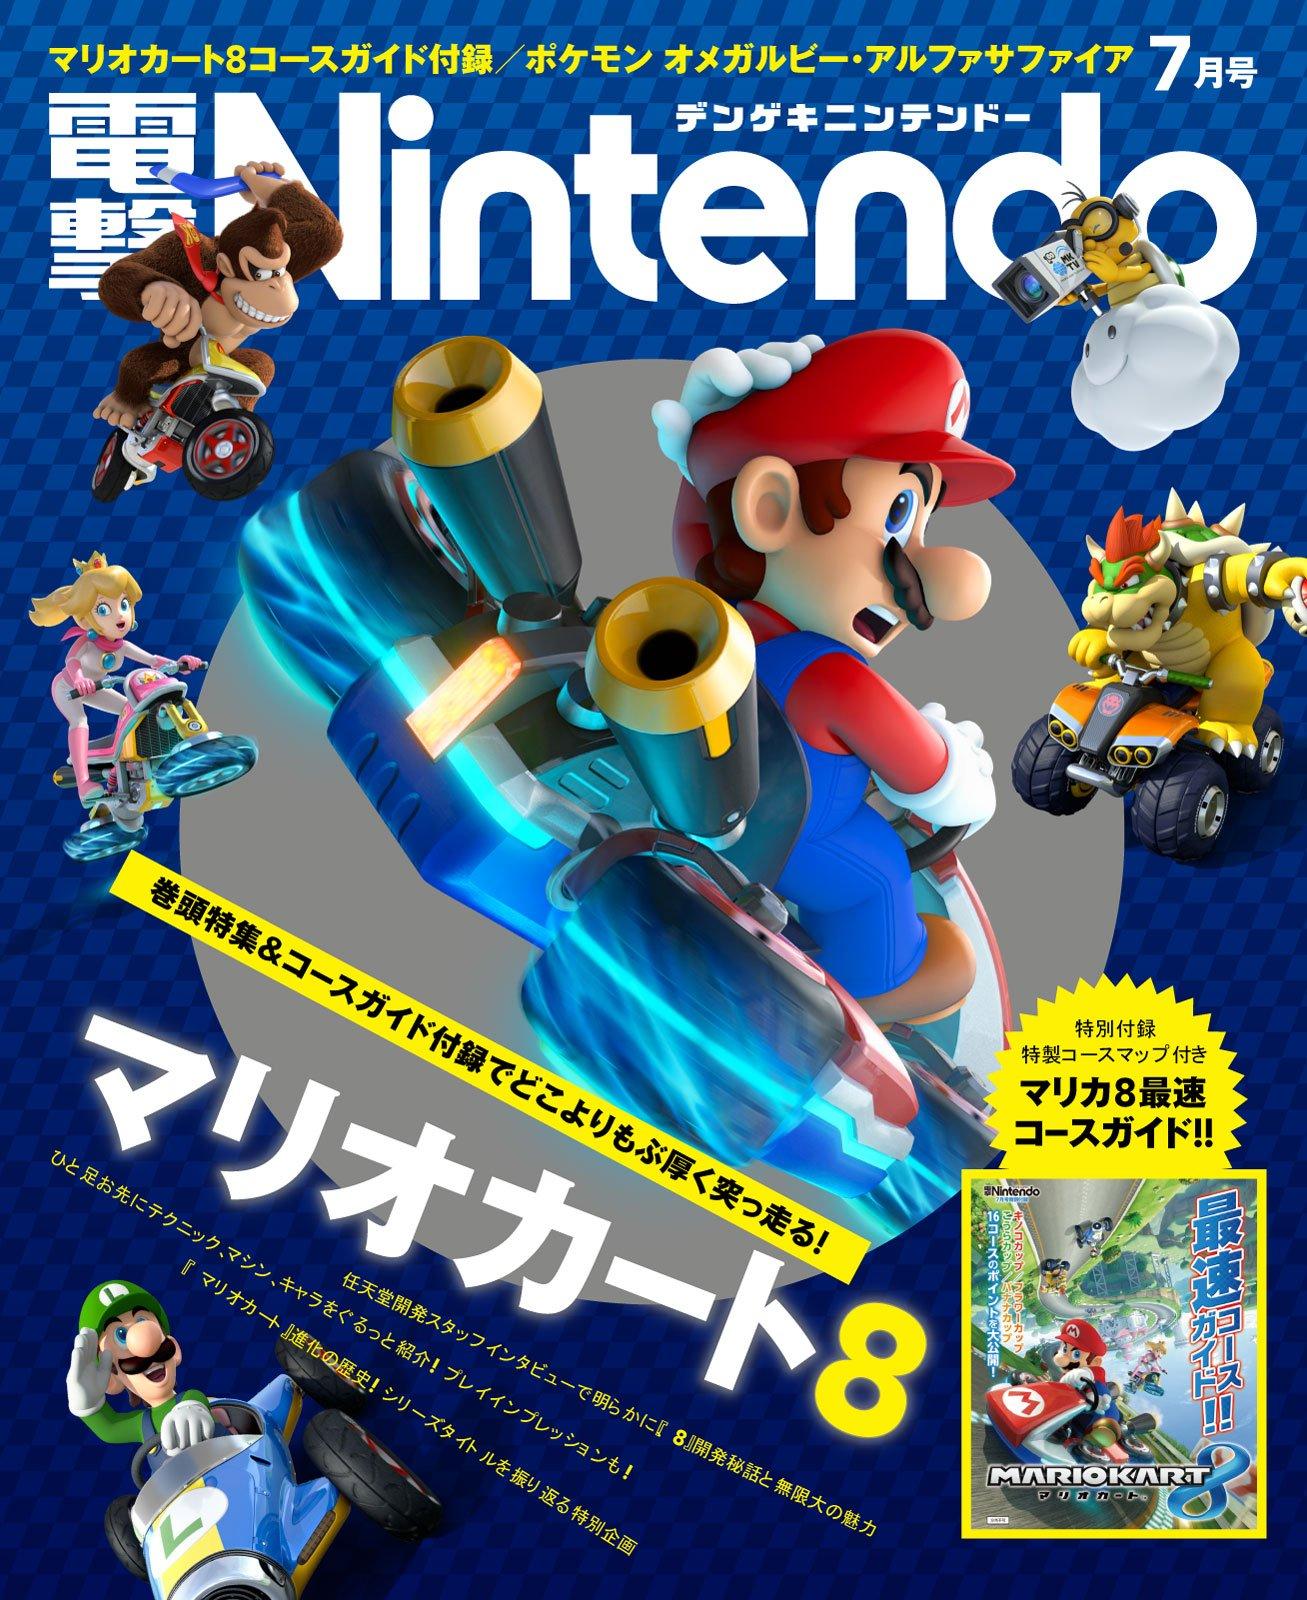 Dengeki Nintendo Issue 014 (July 2014)